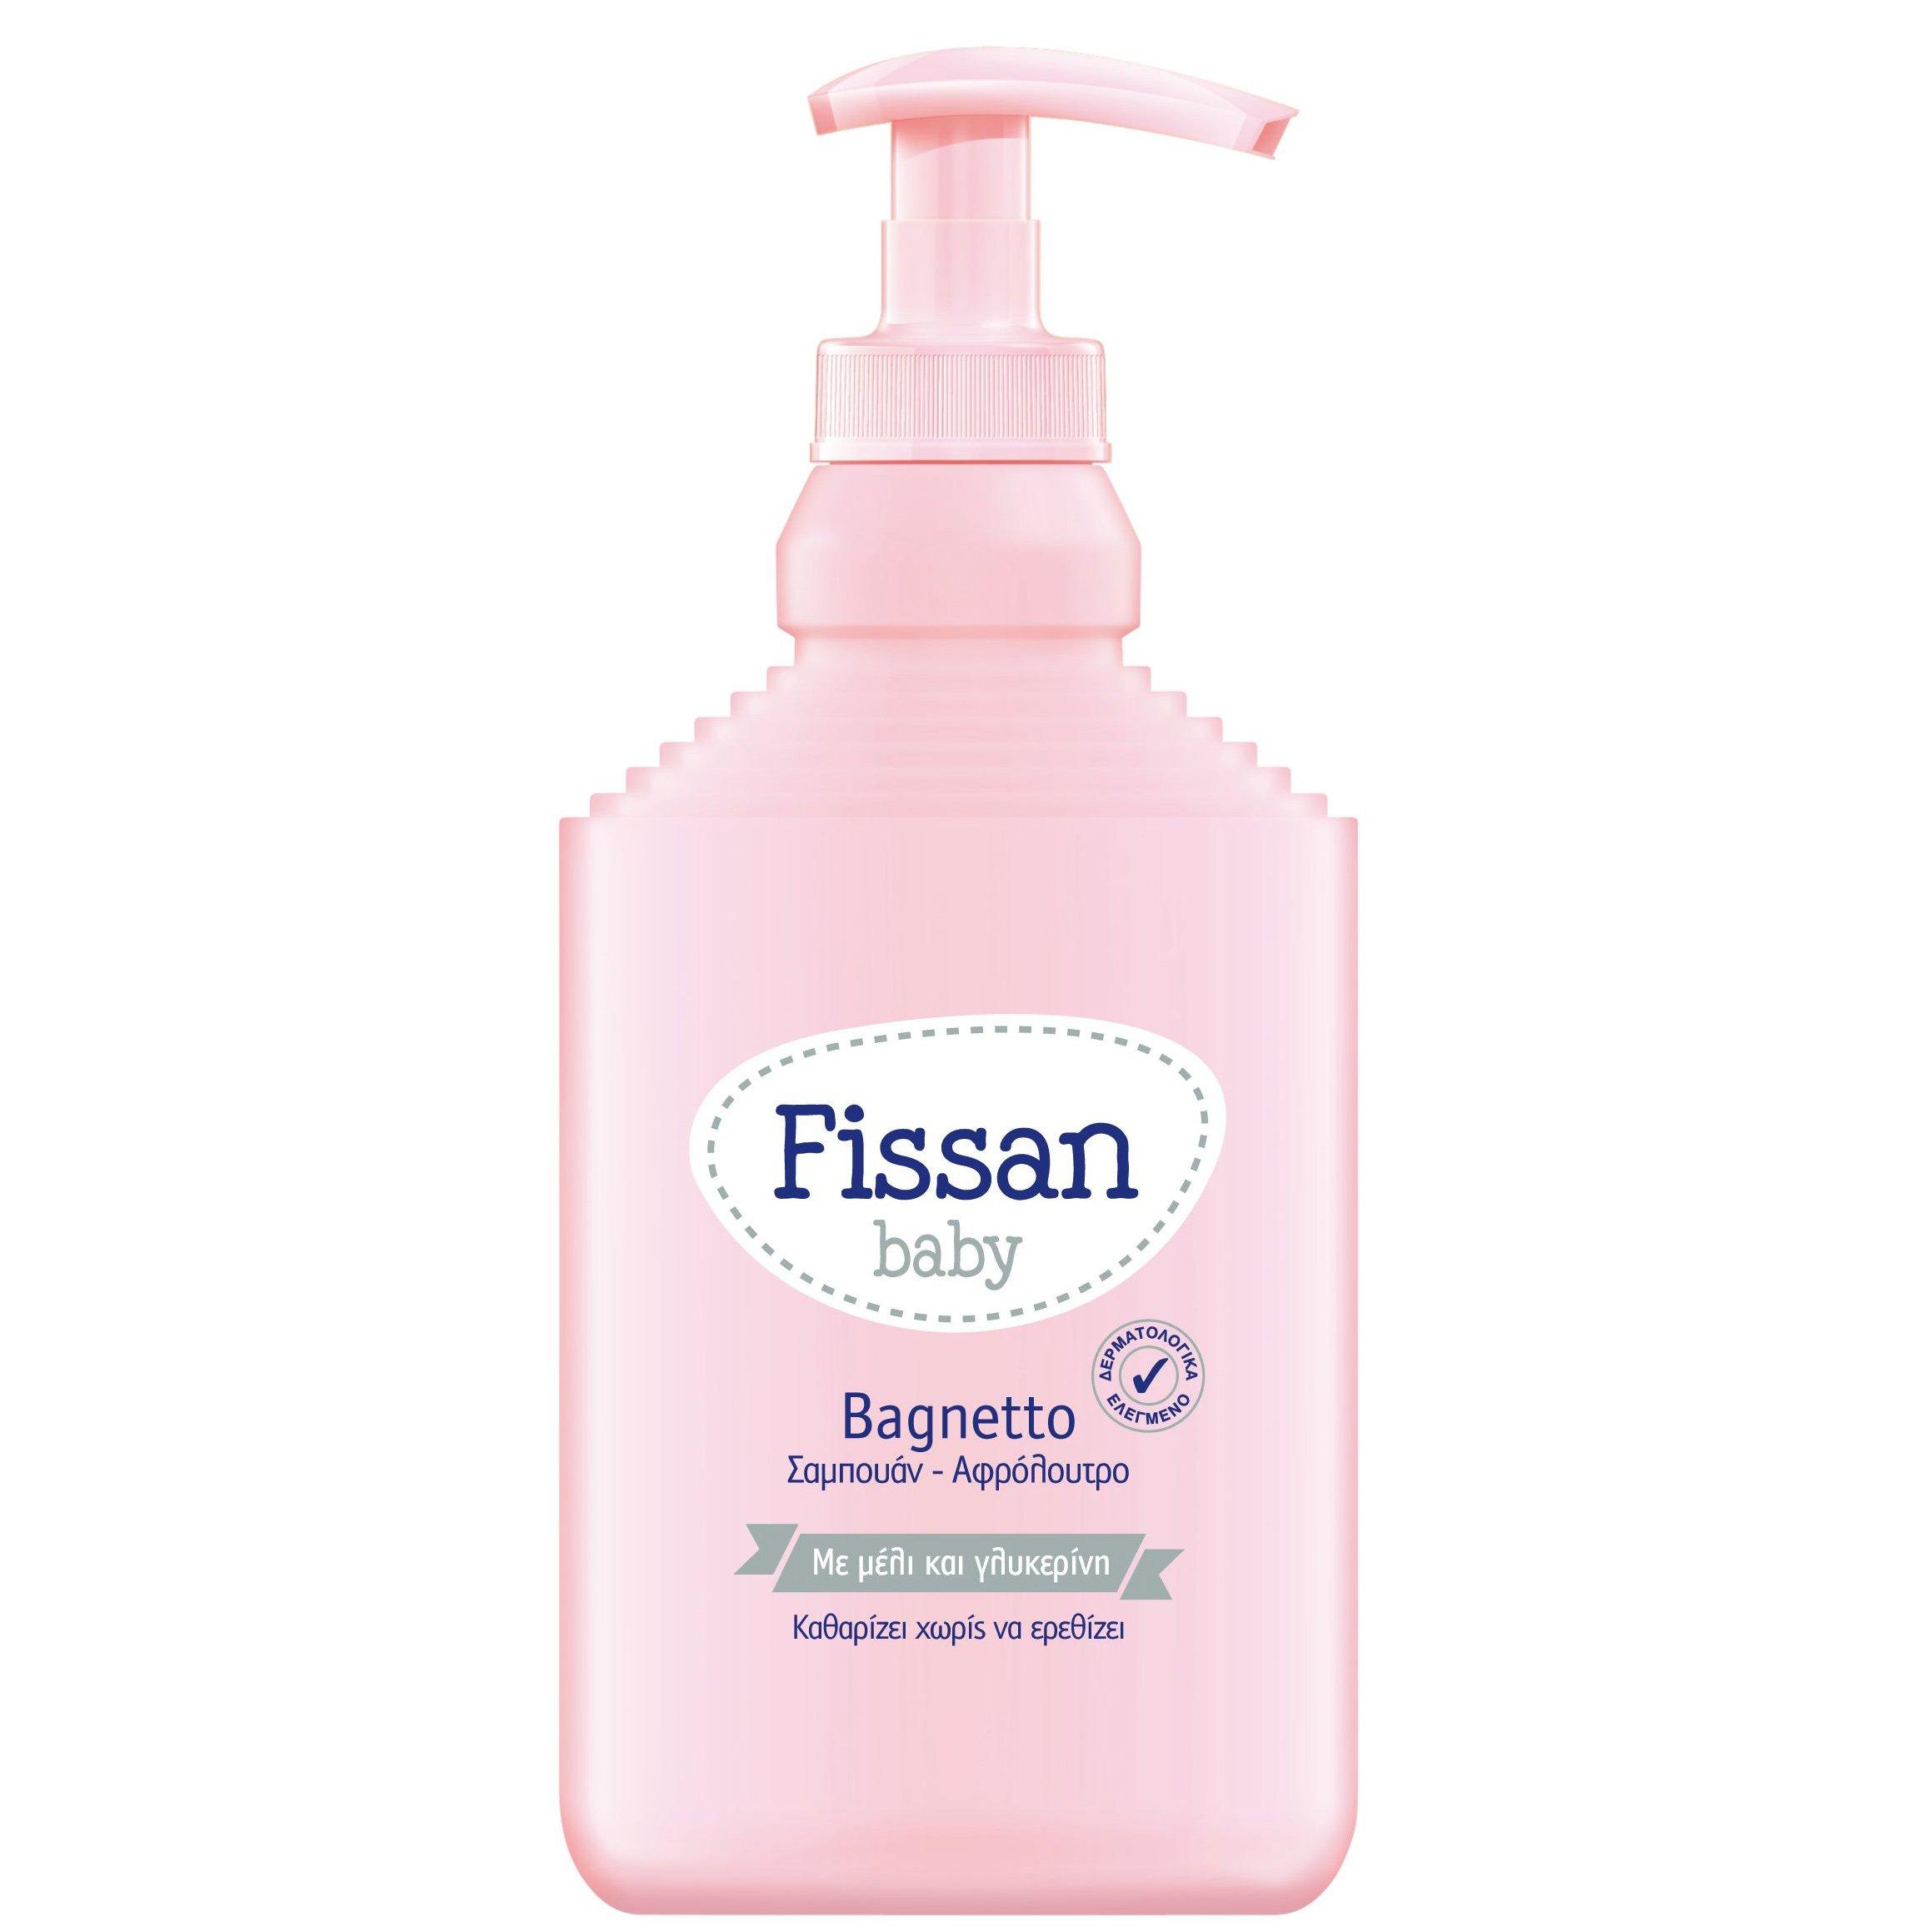 Fissan Baby Bagnetto Σαμπουάν & Αφρόλουτρο με Μέλι & Γλυκερίνη 500ml Προσφορά – 2 €